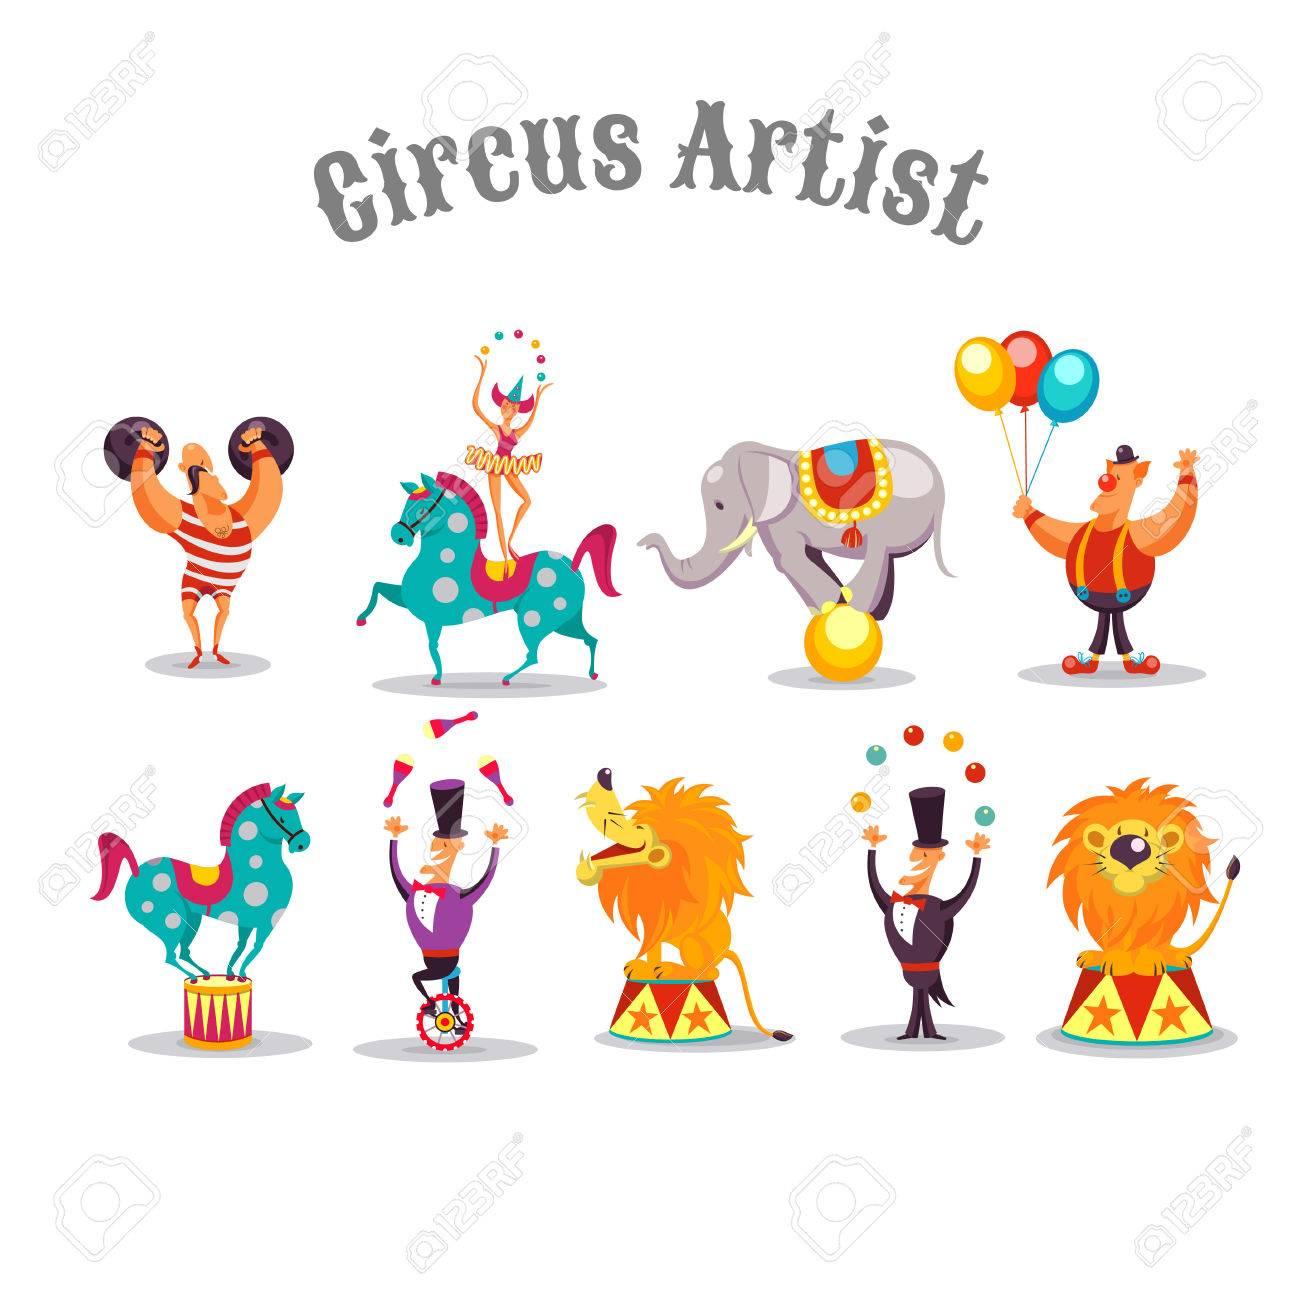 Artistes De Cirque Ensemble De Caracteres Vectoriels Homme Fort